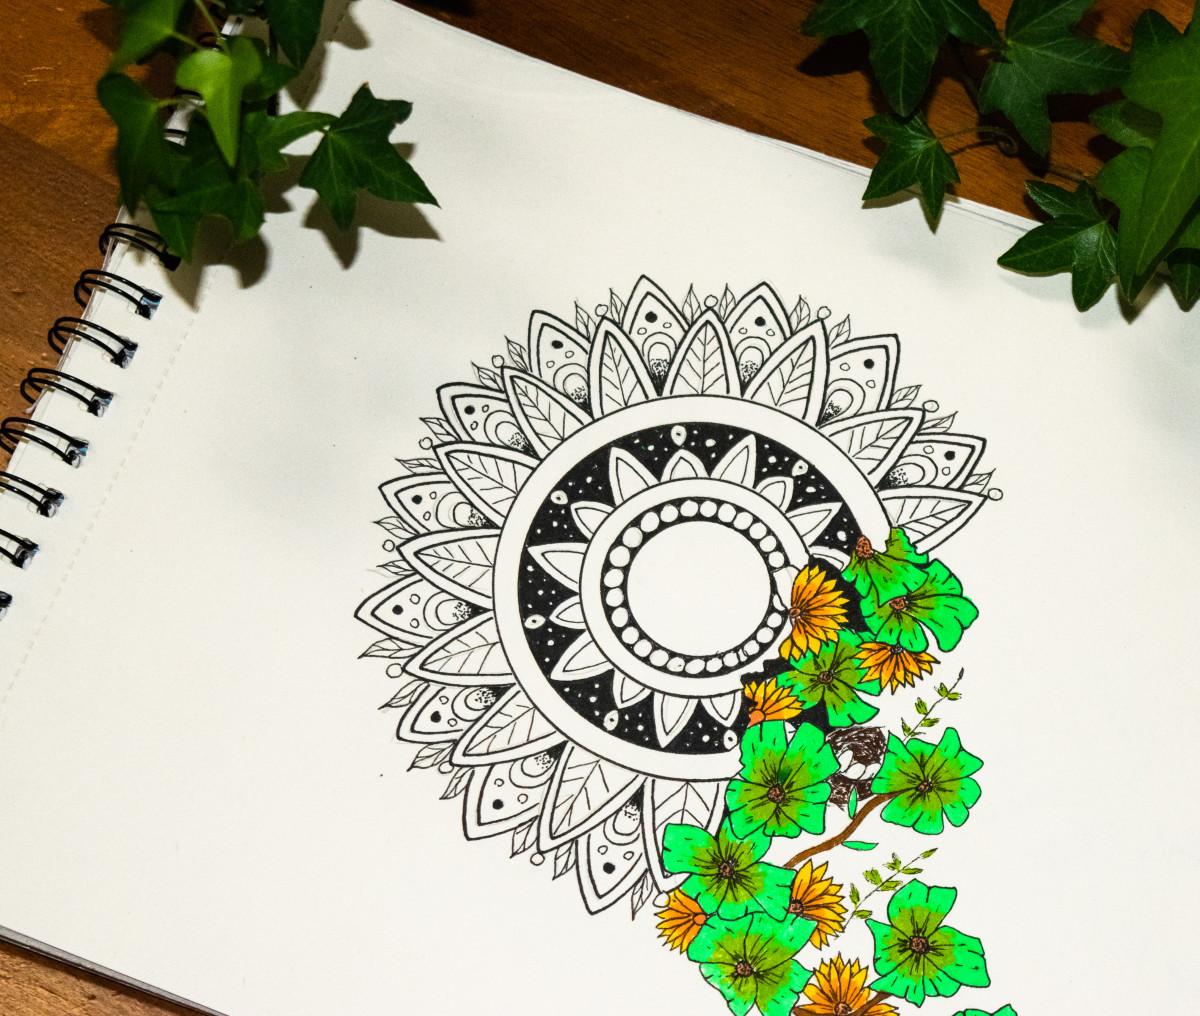 essay-on-creativity